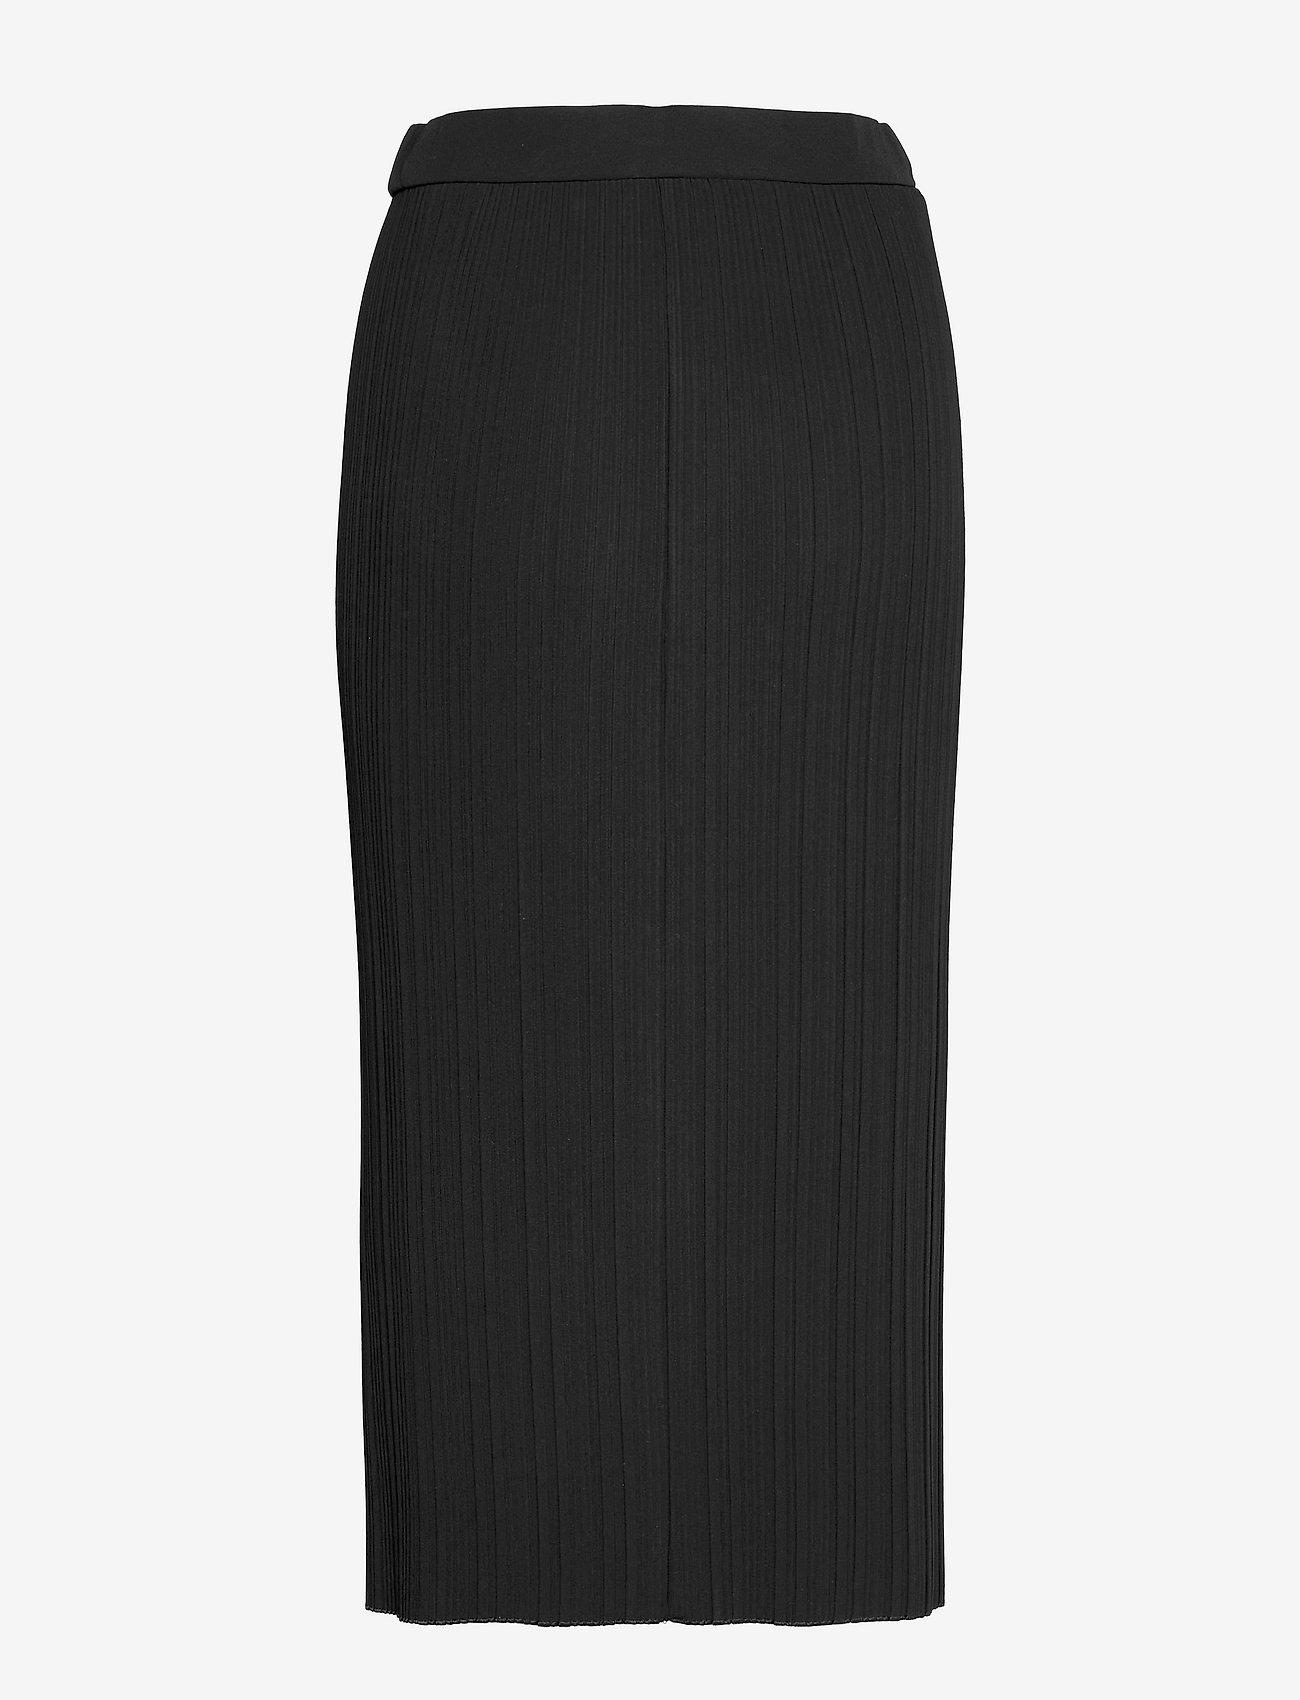 Max Mara Leisure - RARO - midi skirts - black - 1